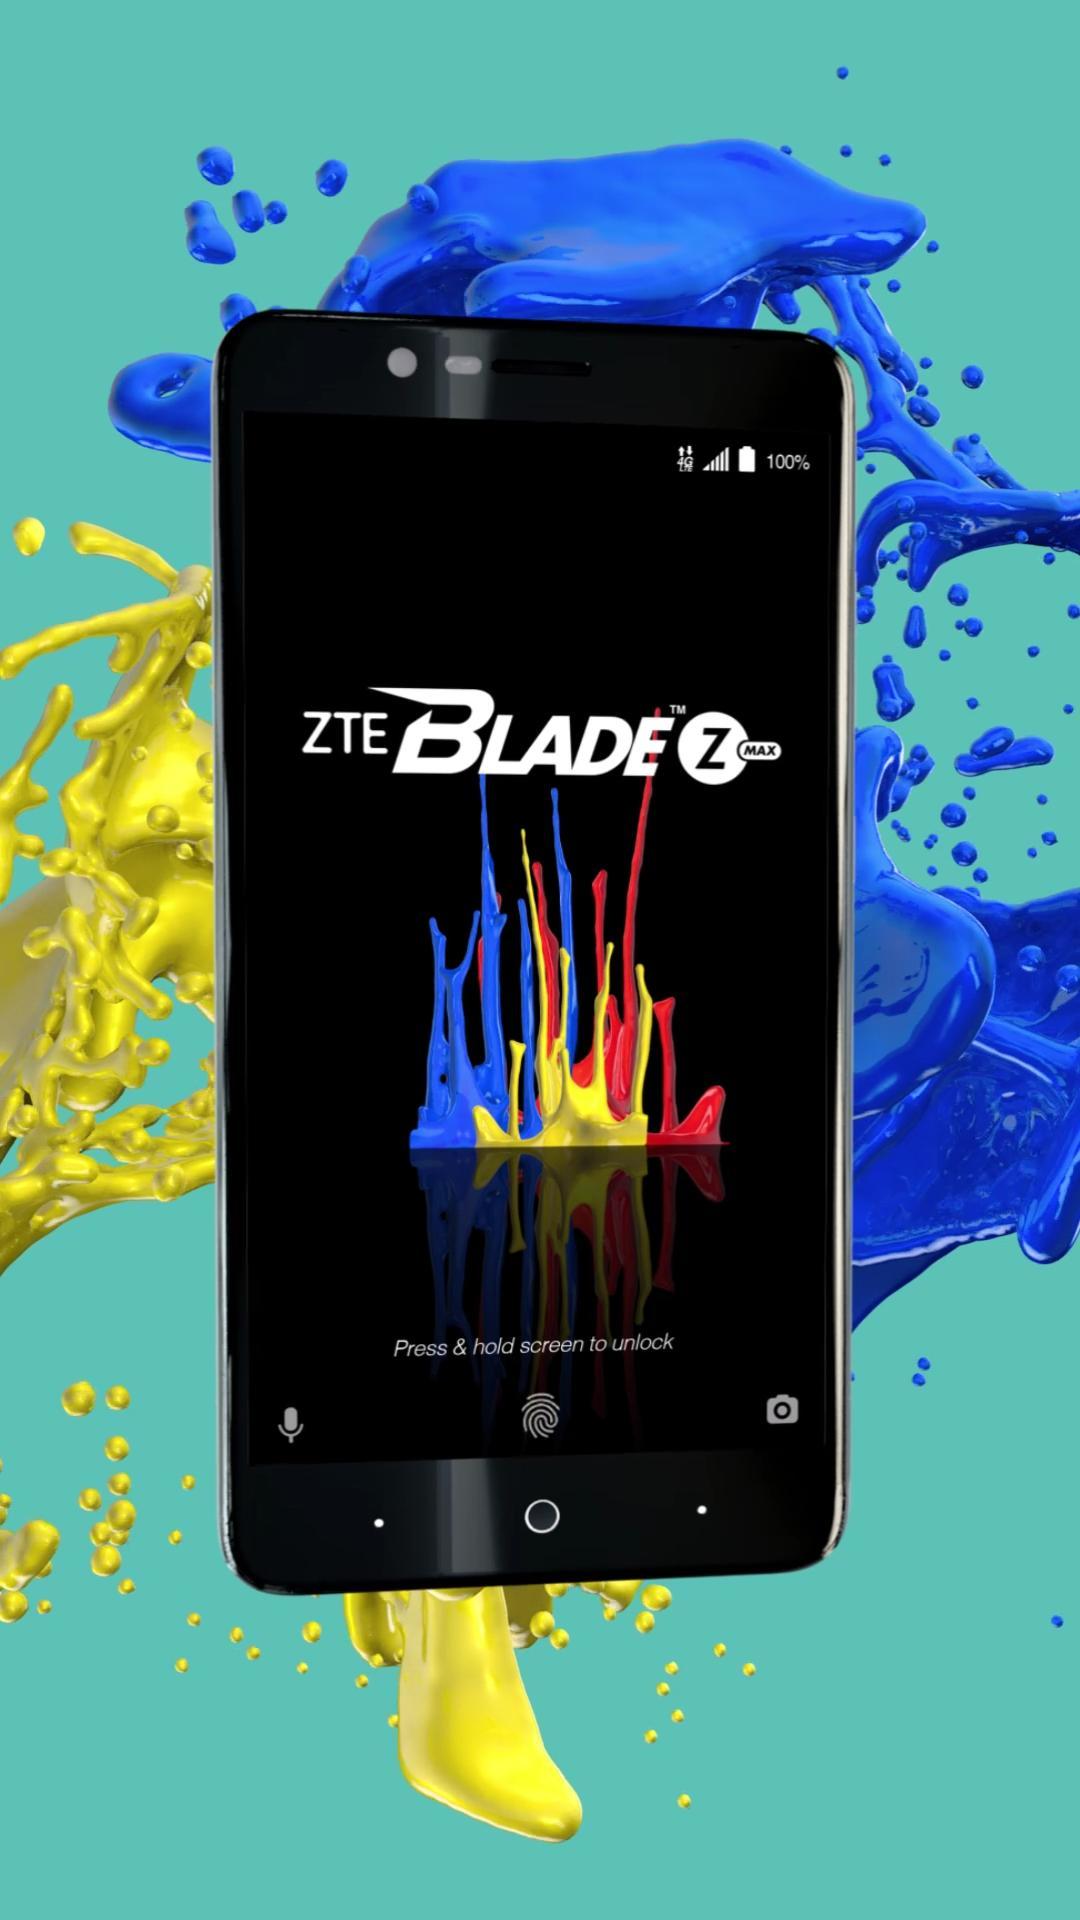 ZTE BLADE Zmax Demo metroPCS for Android - APK Download